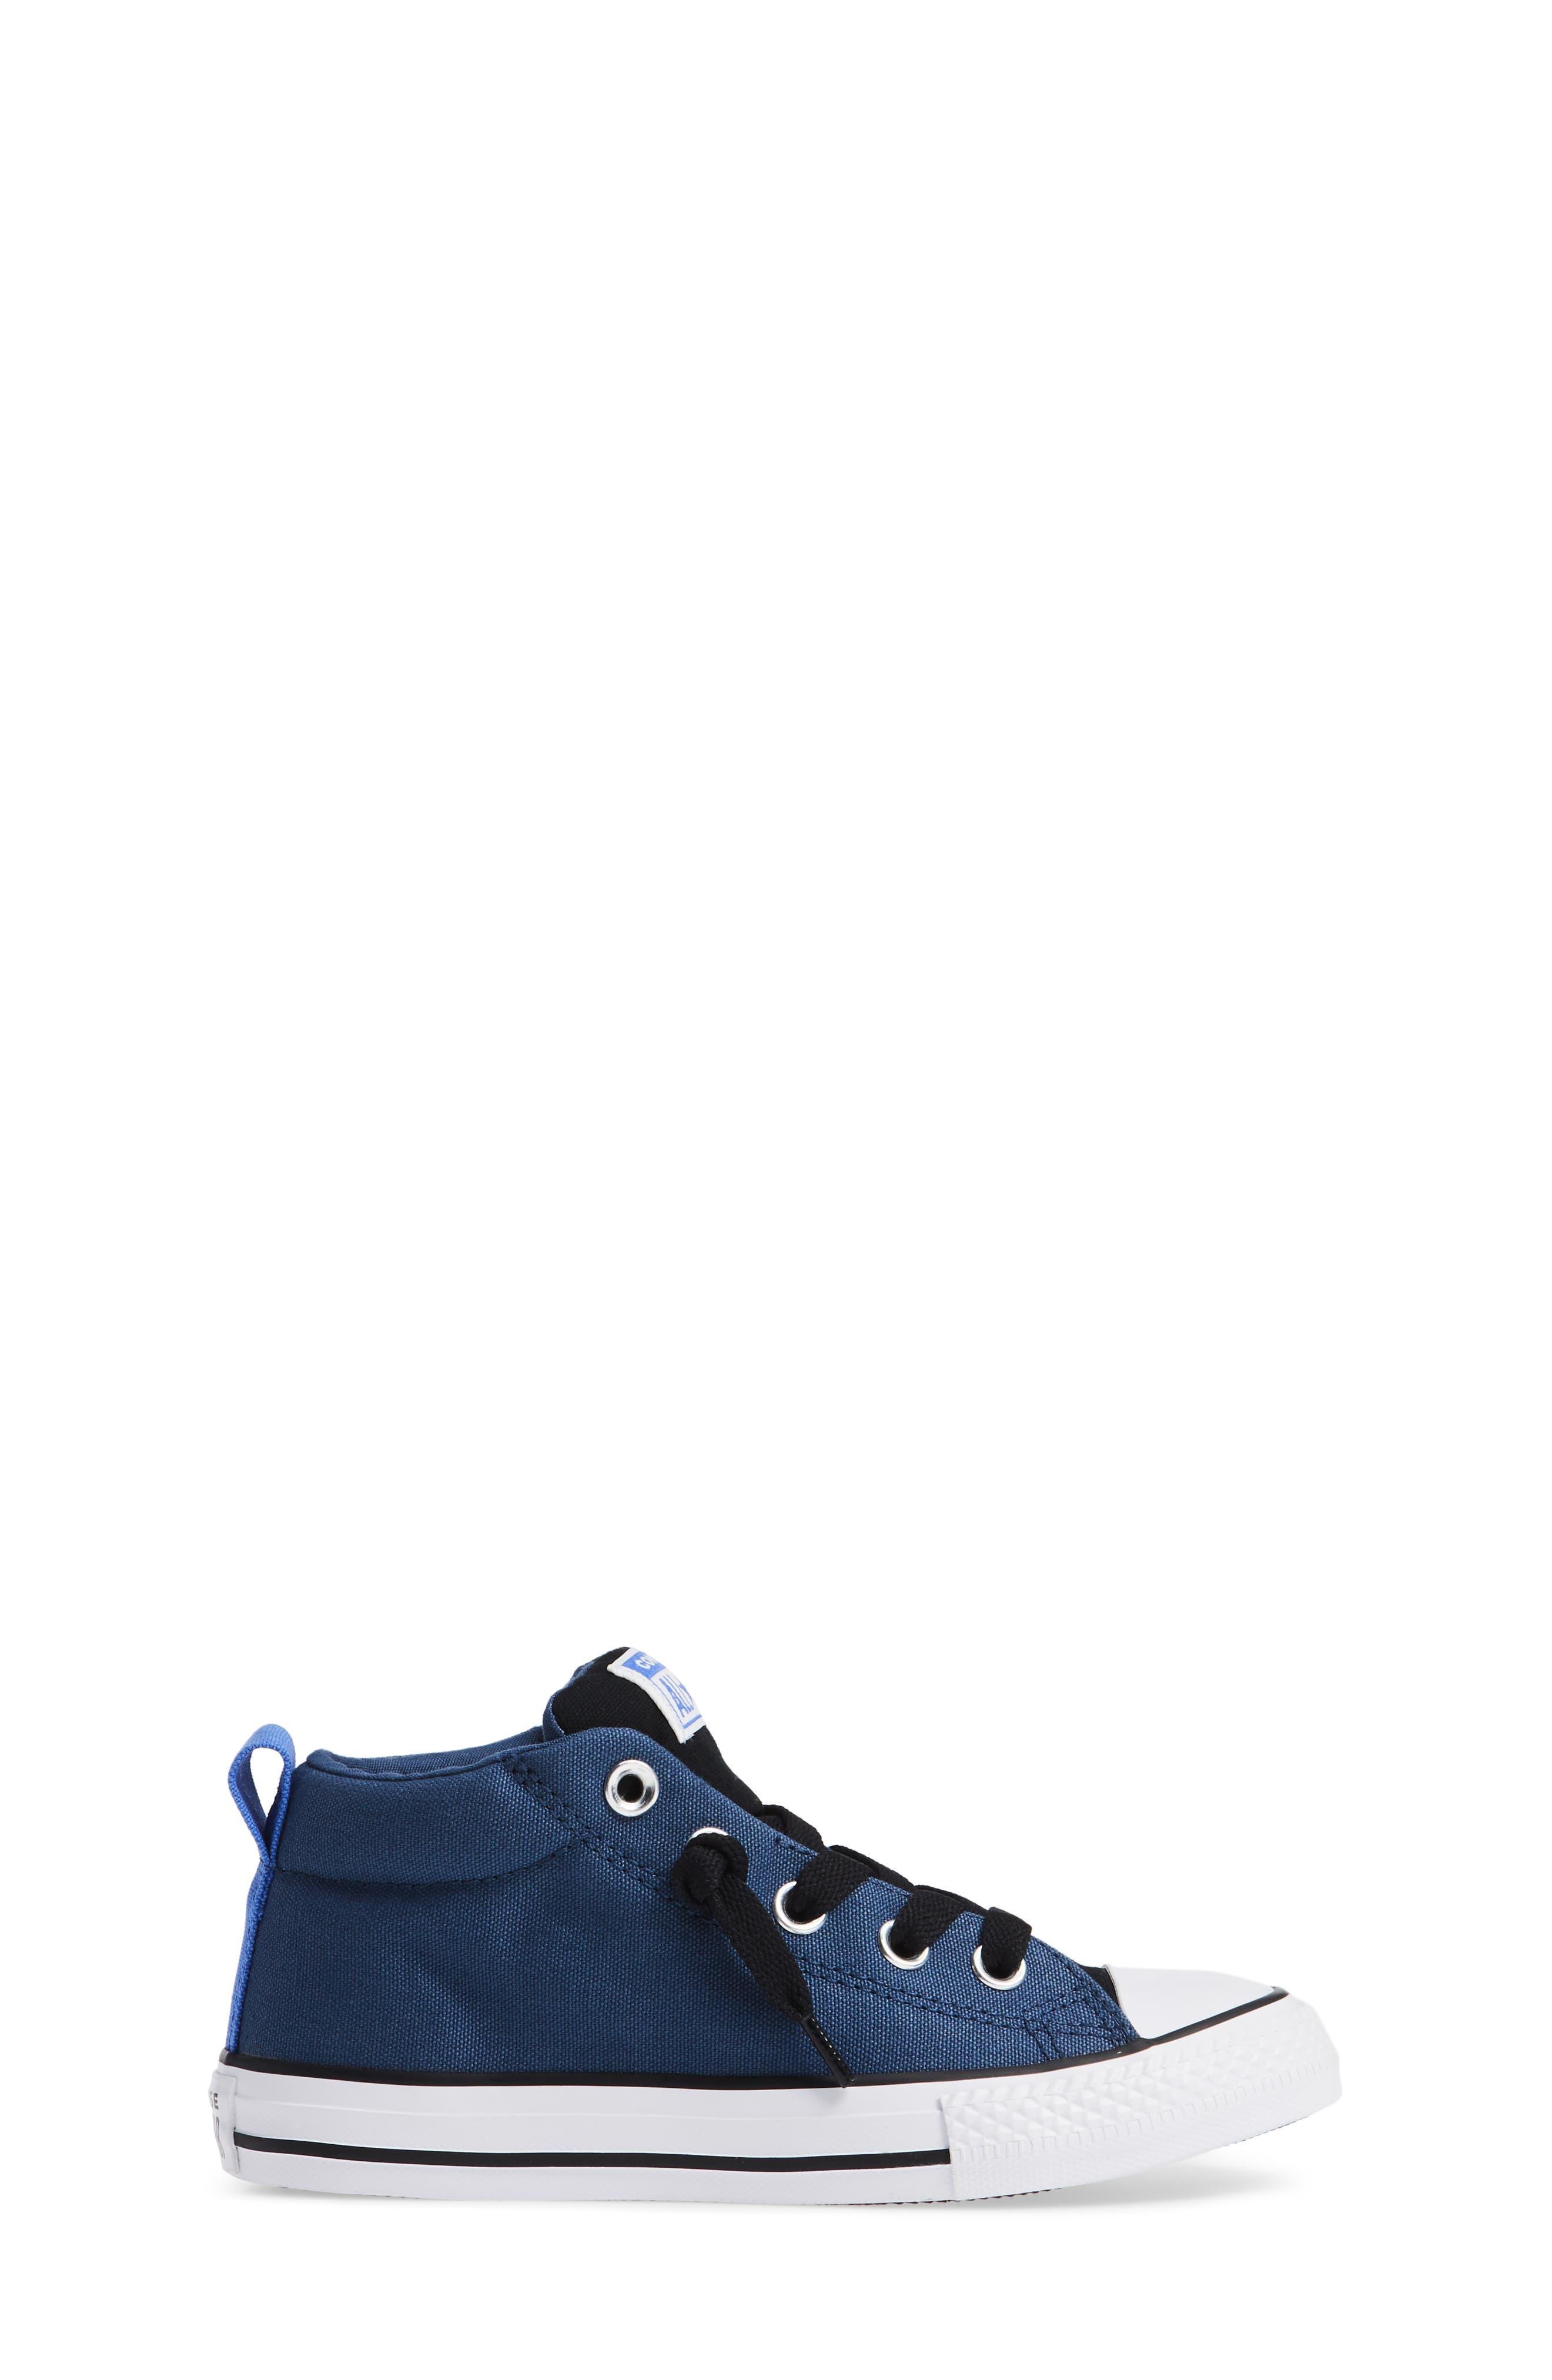 CONVERSE,                             Chuck Taylor<sup>®</sup> All Star<sup>®</sup> Seasonal Street Sneaker,                             Alternate thumbnail 3, color,                             403